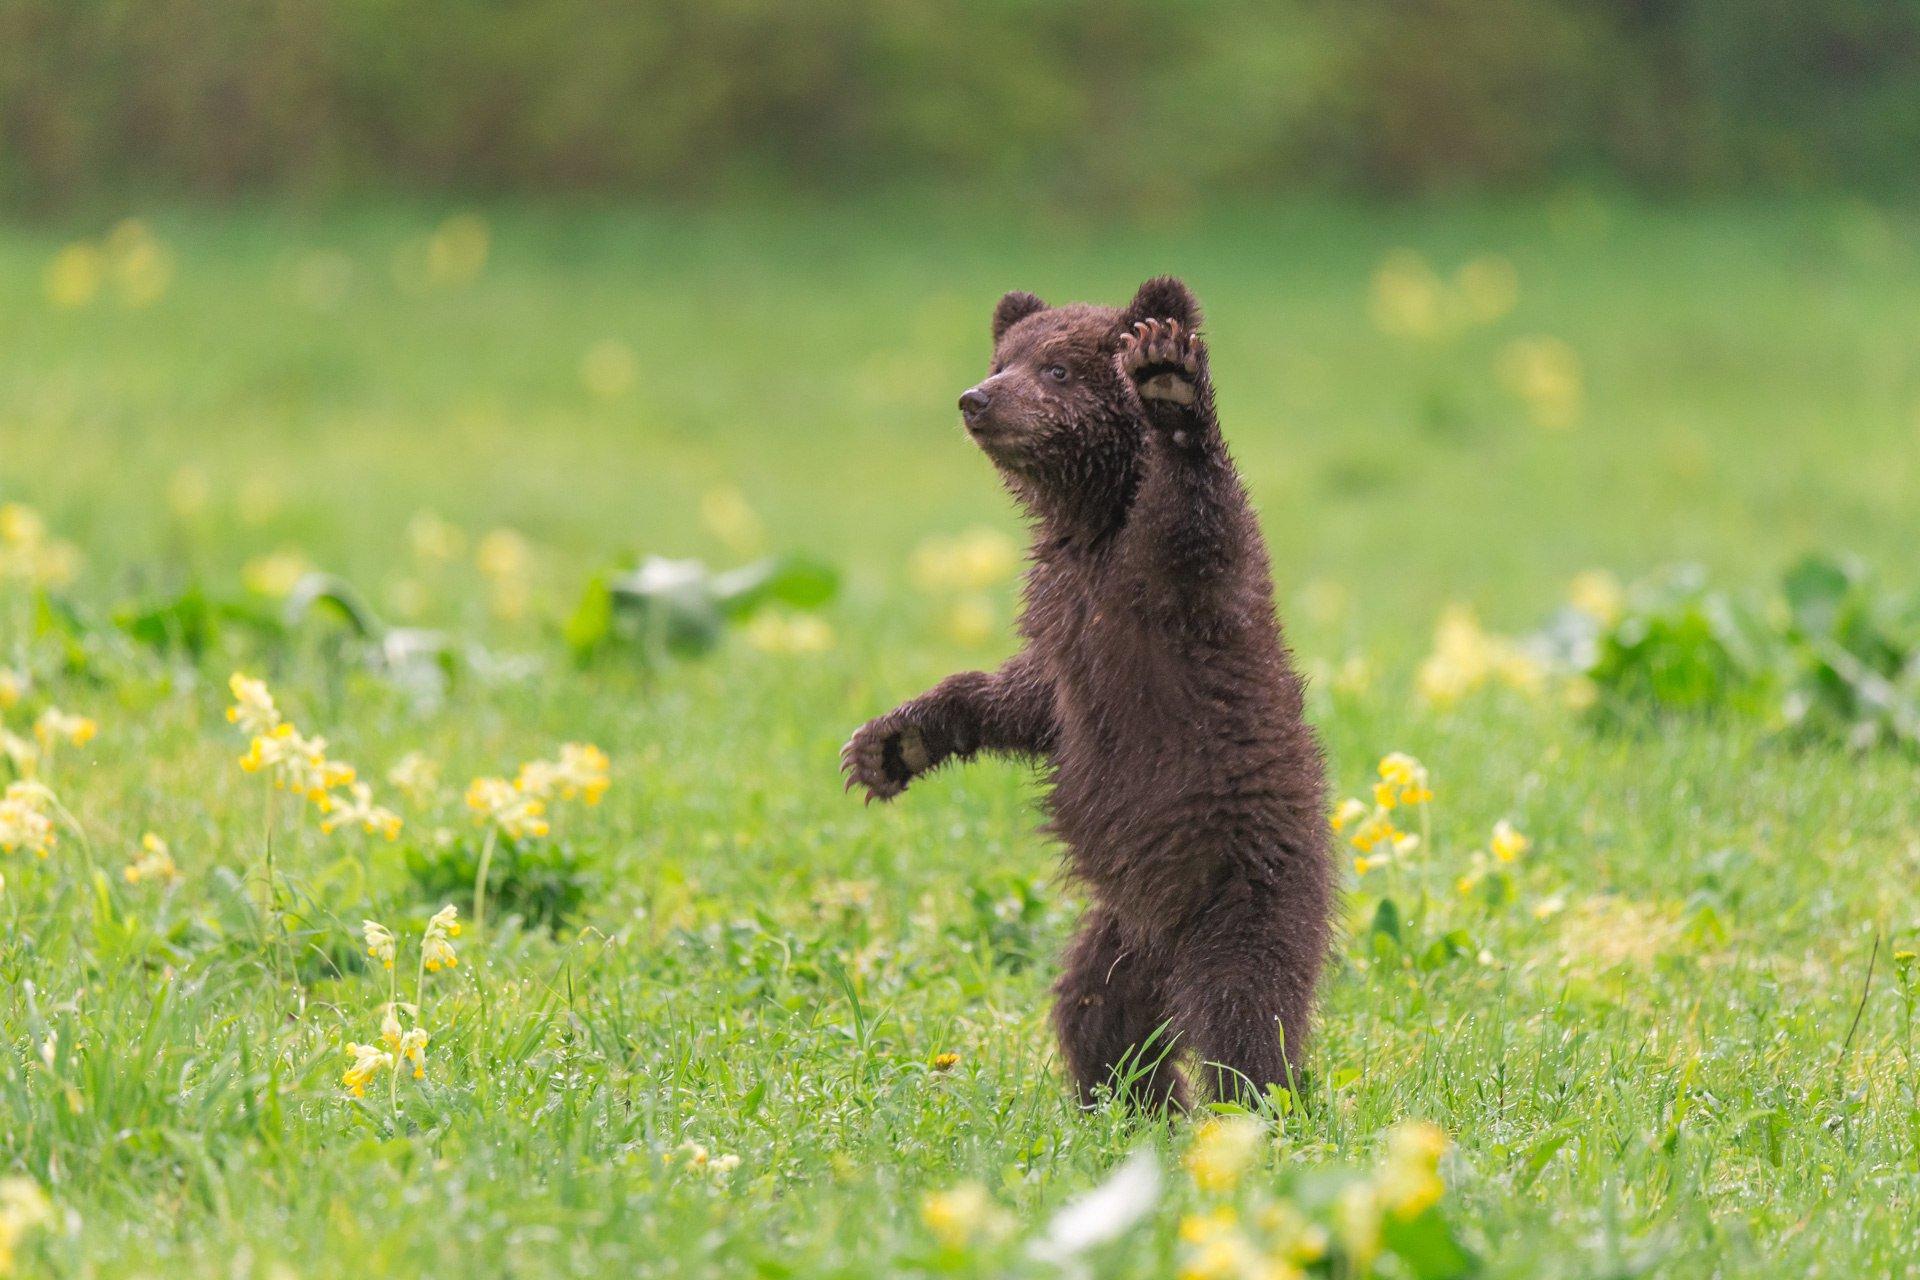 медвежата картинки привет спасет мир, спасем